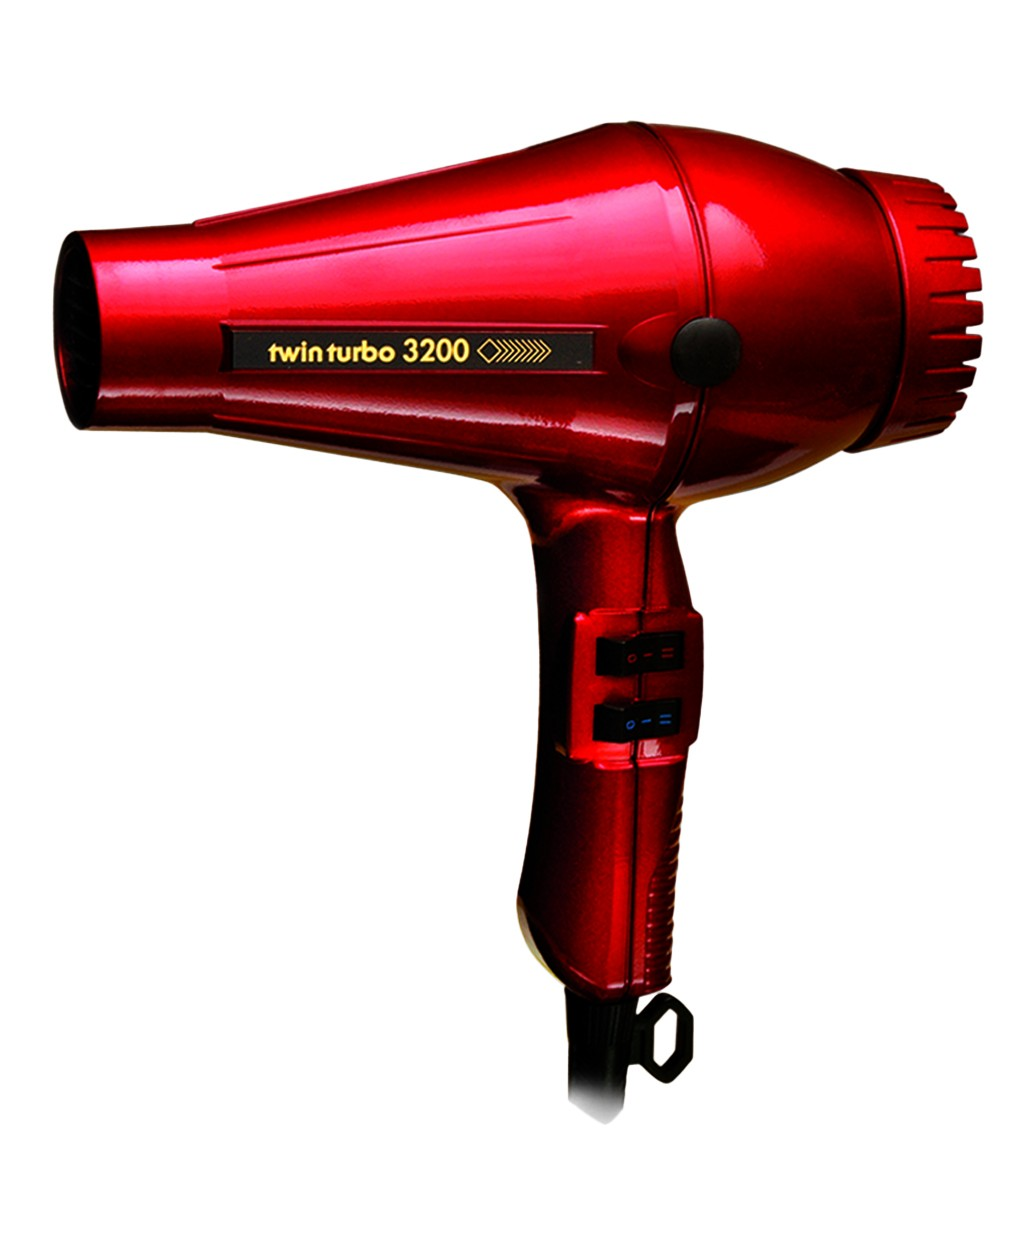 Turbo Power Twin Turbo 3200 Professional Hair Dryer